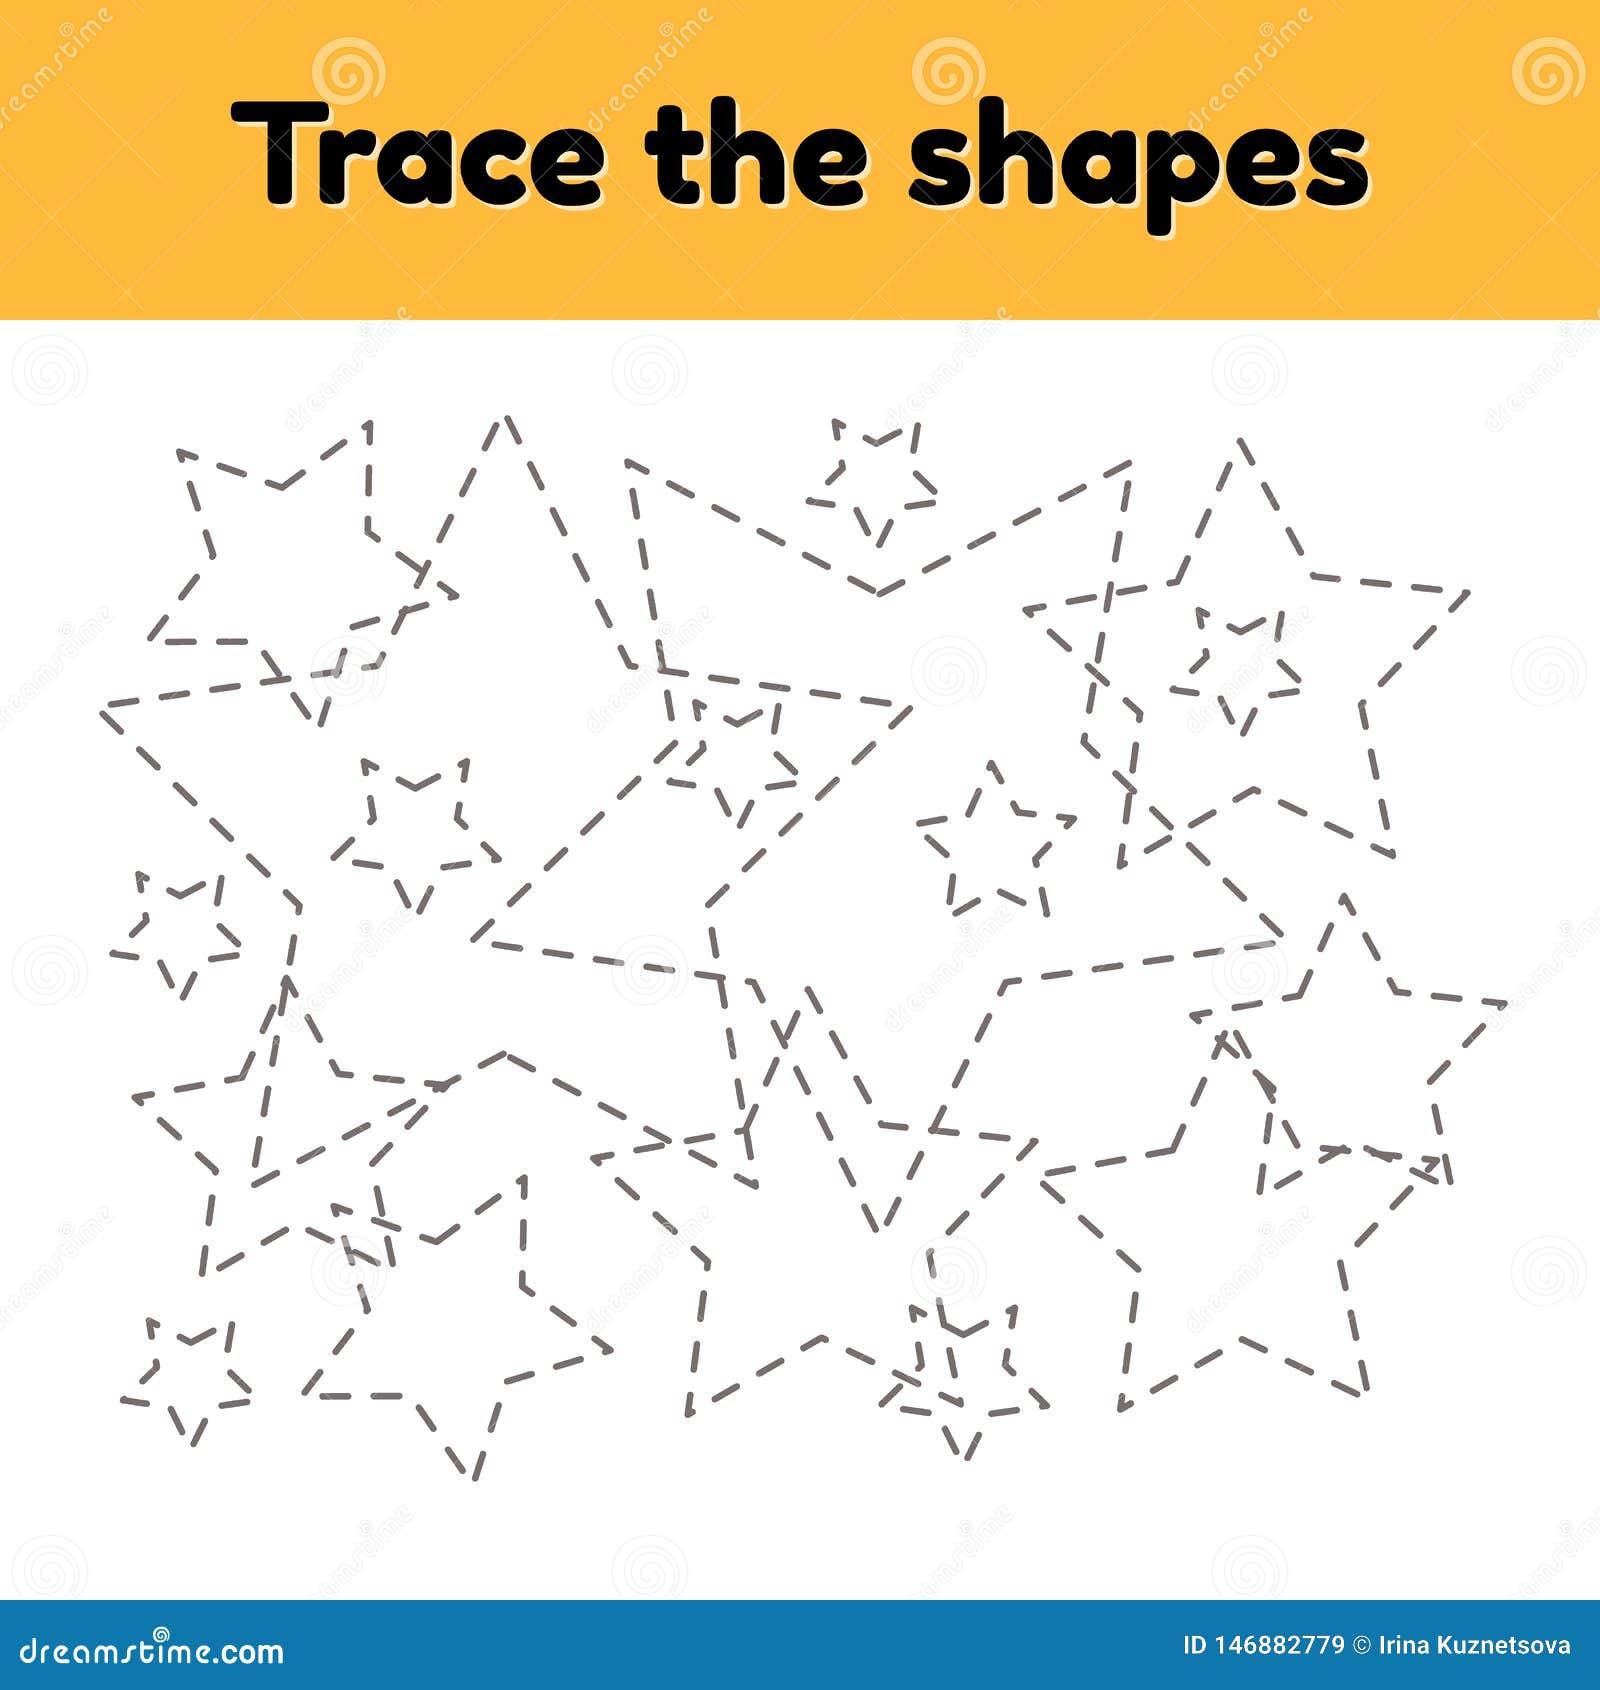 Educational Tracing Worksheet For Kids Kindergarten, Preschool And ...